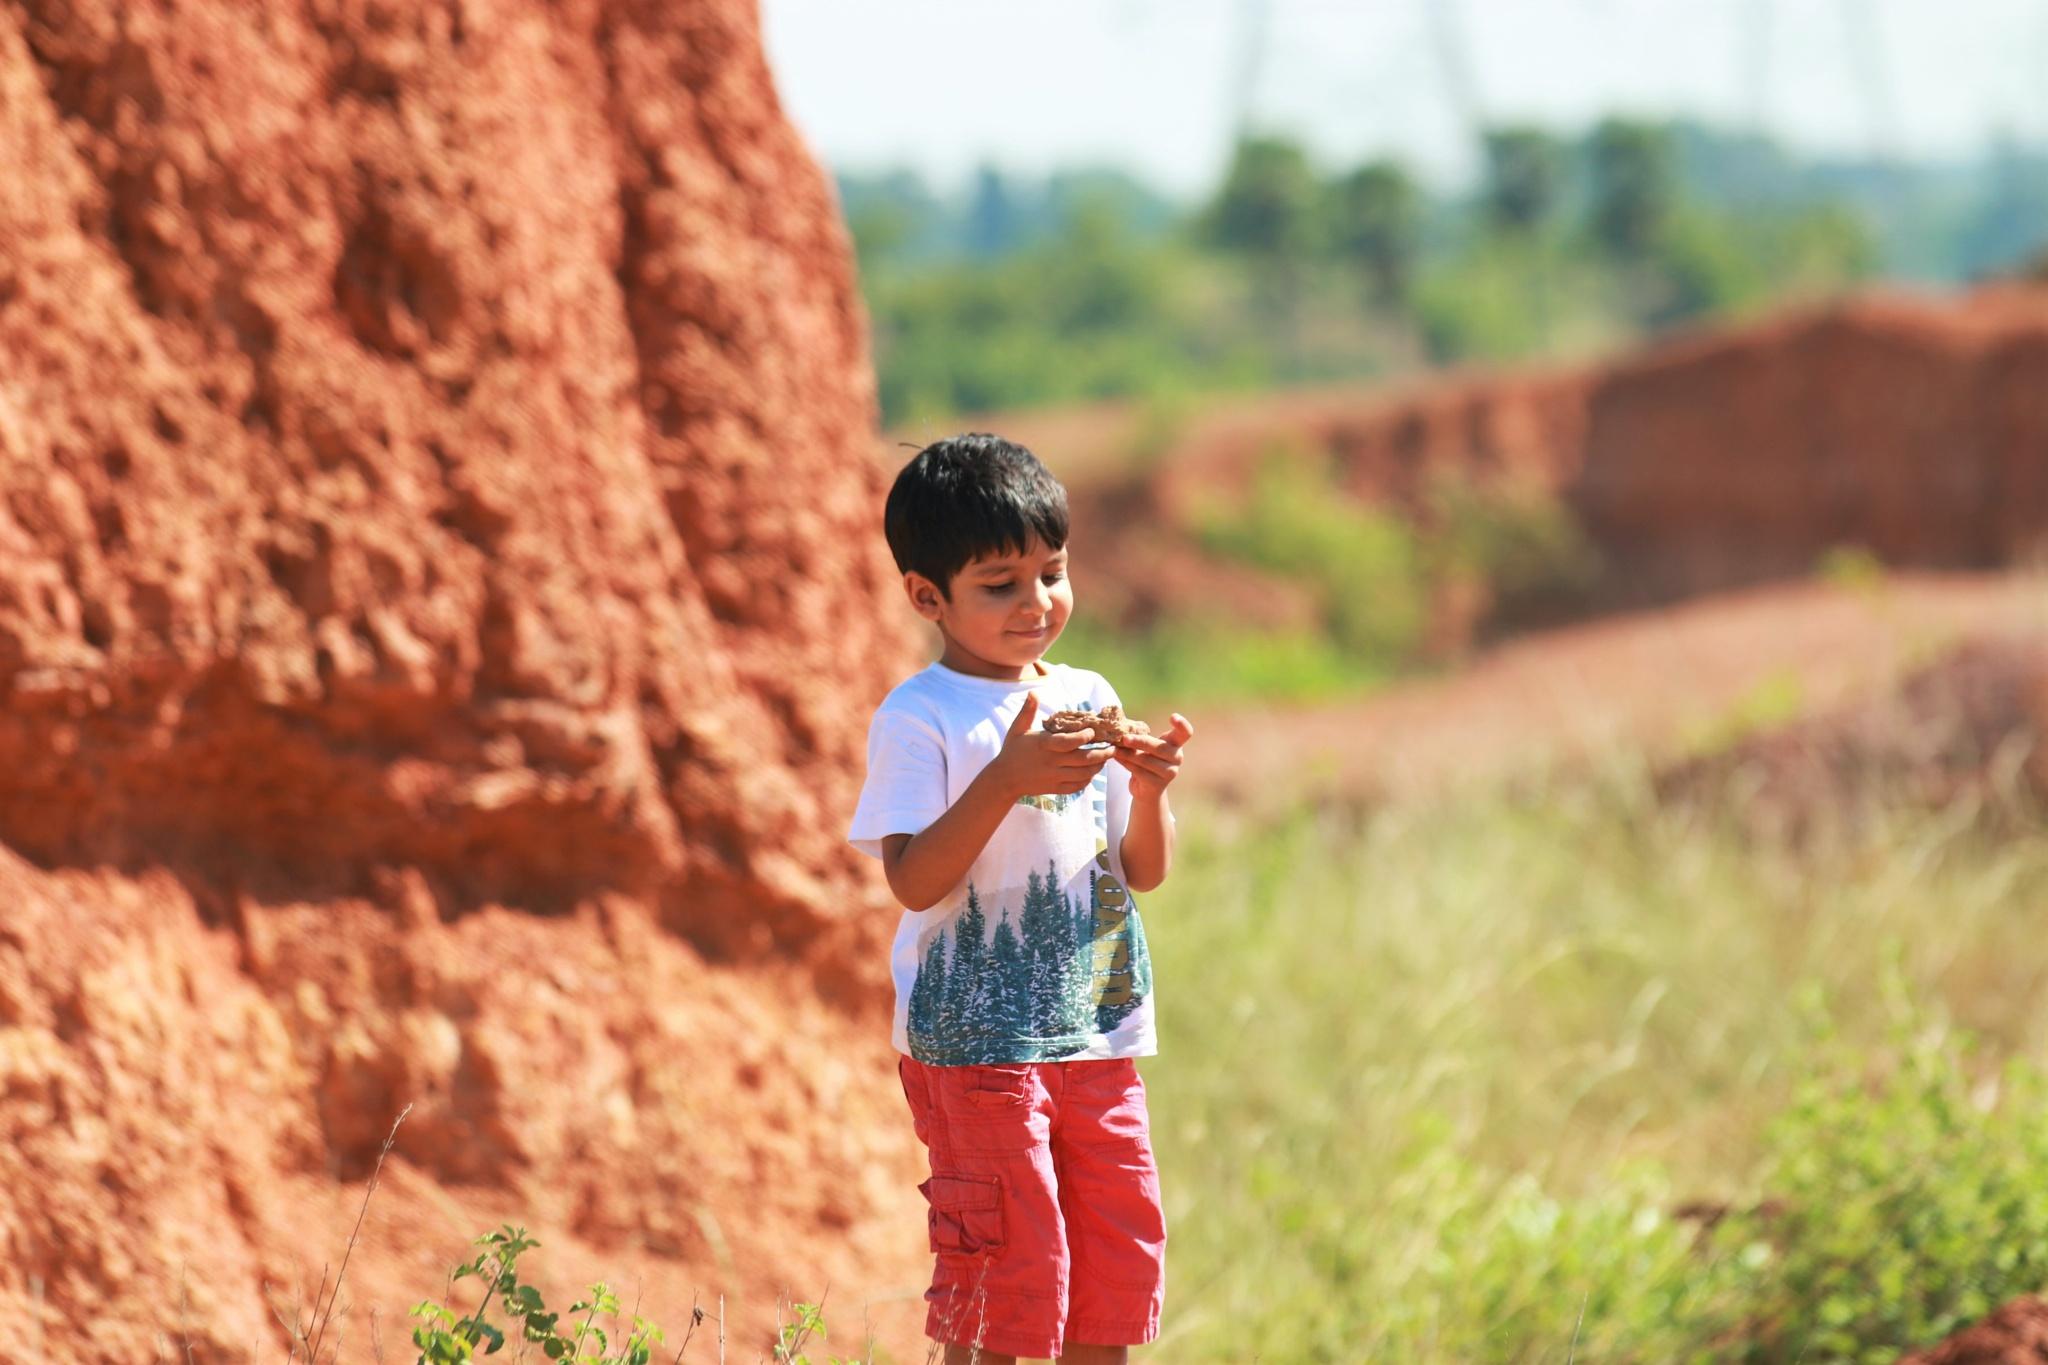 Child play by mloka33